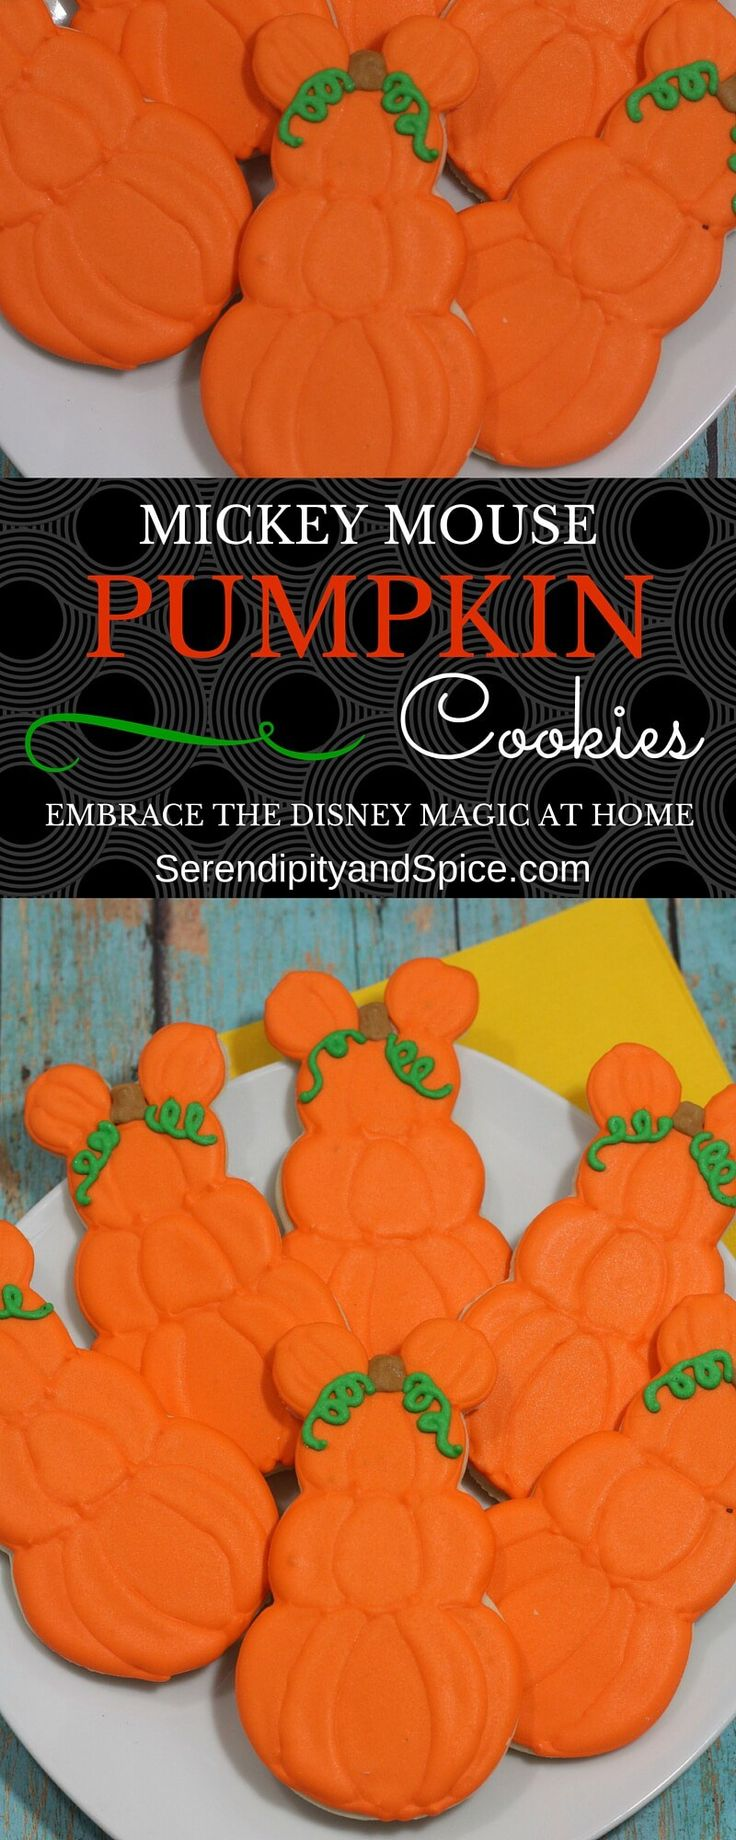 Mickey Mouse Pumpkin Cookies Recipe ~ http://serendipityandspice.com